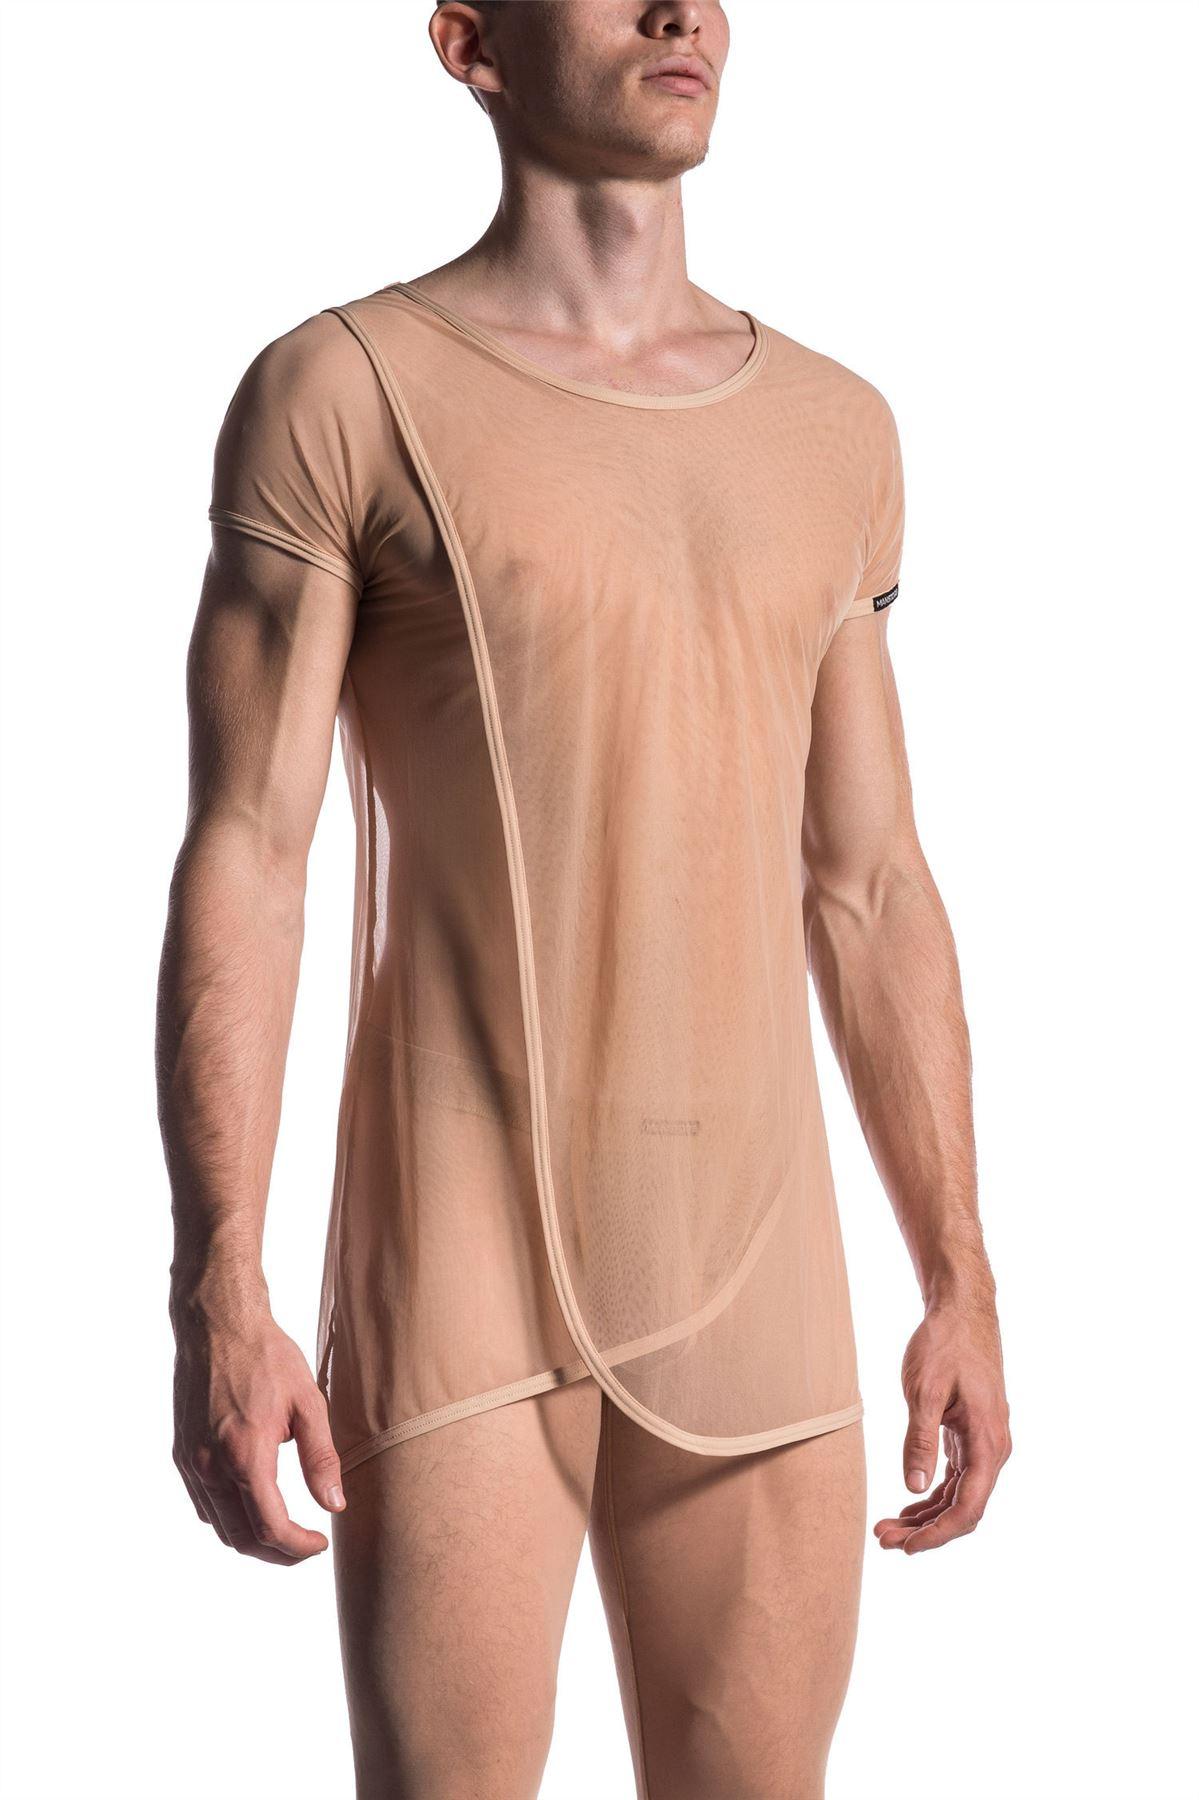 men Naked white woman s shirt